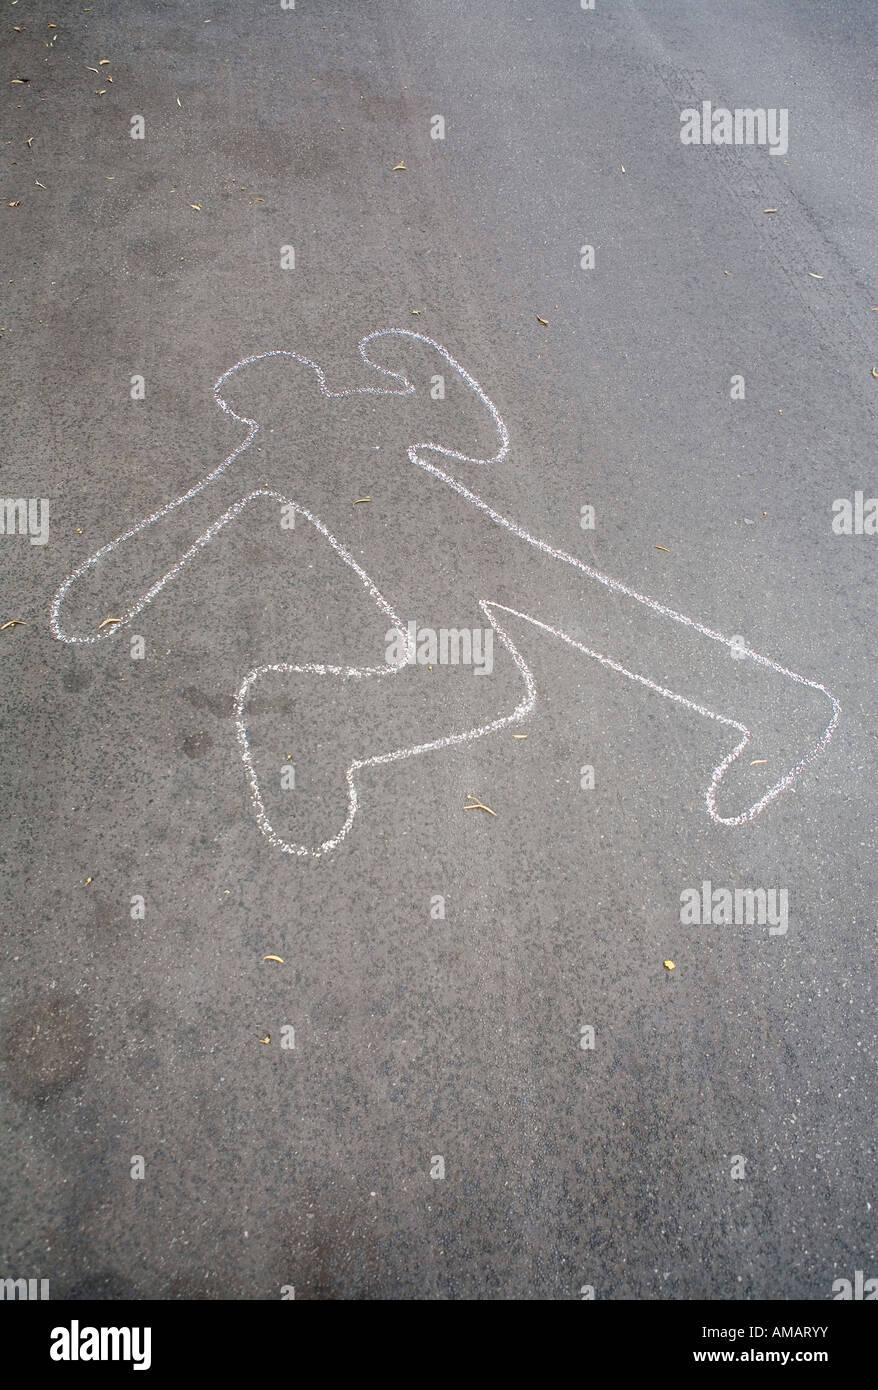 Chalk Outline Of A Body Stockfotos & Chalk Outline Of A Body Bilder ...